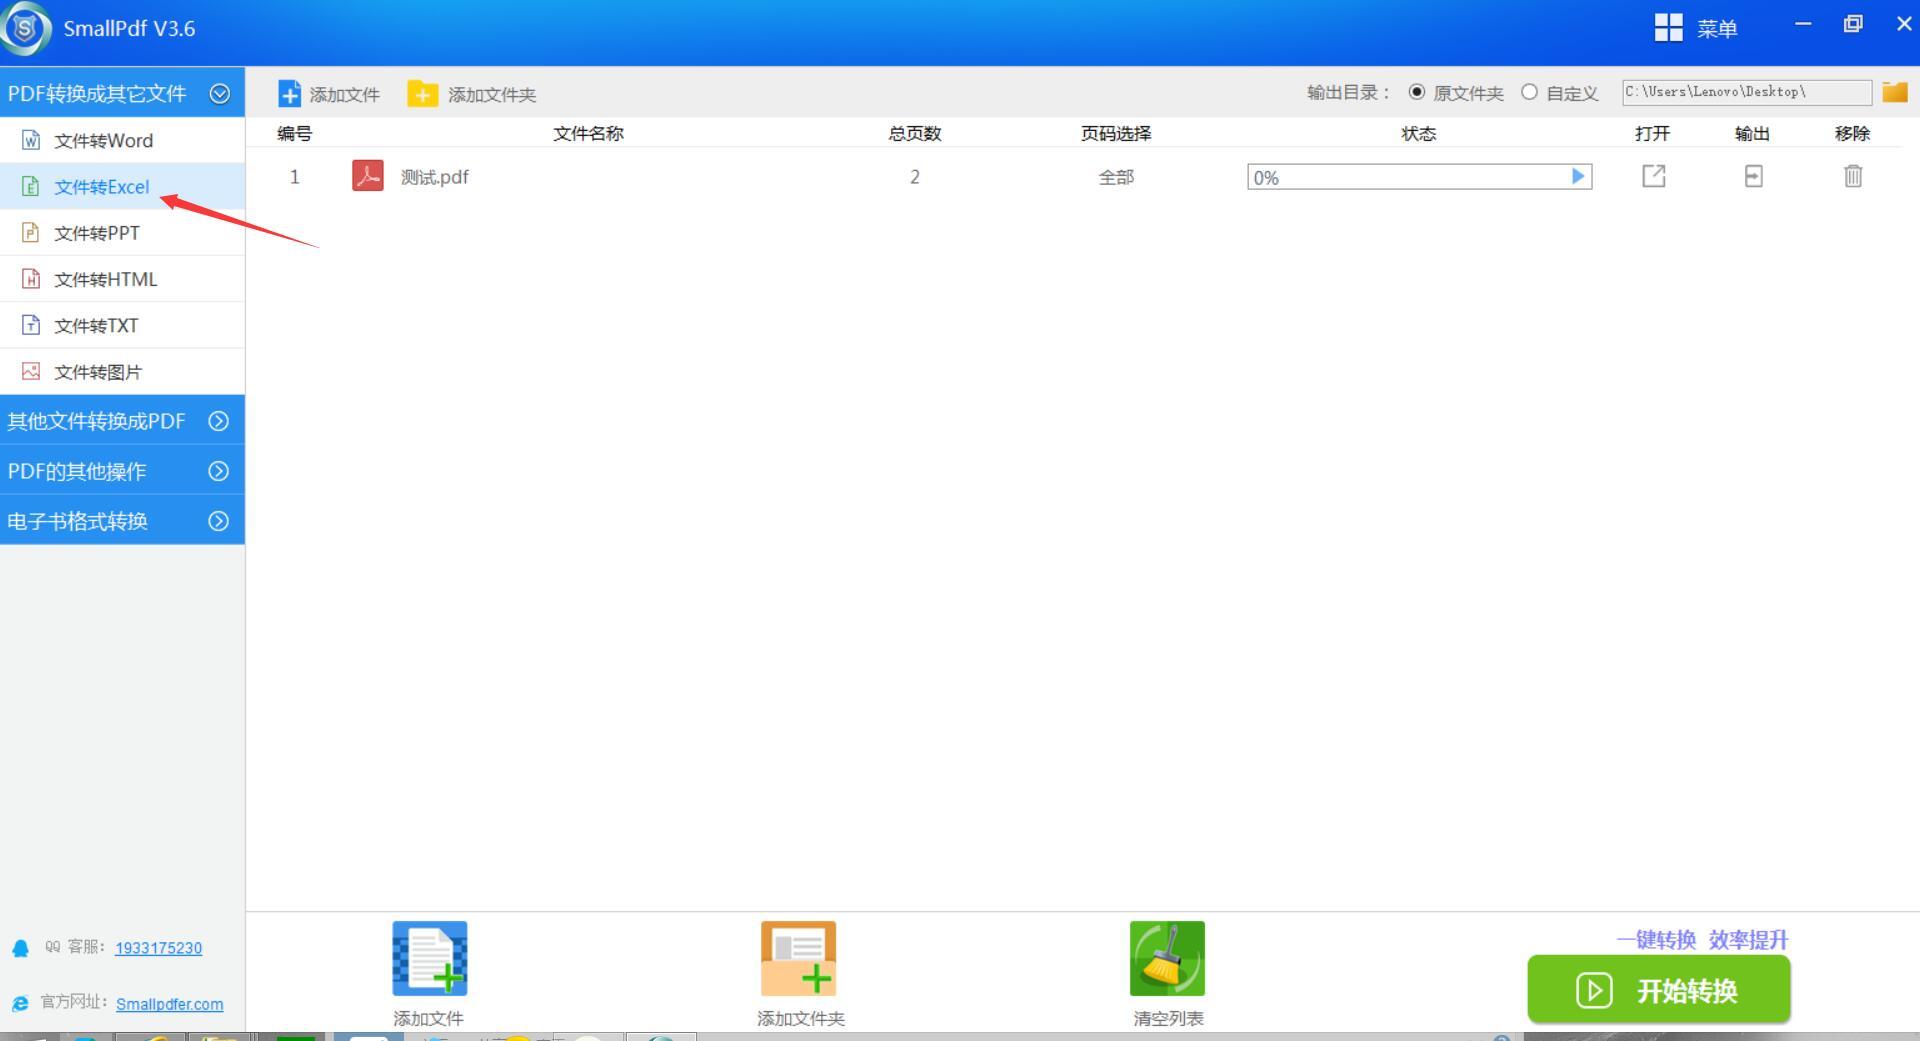 pdf转换器成excel_怎样用small pdf转换器将PDF转换成excel文档呢?-使用教程-Smallpdf ...